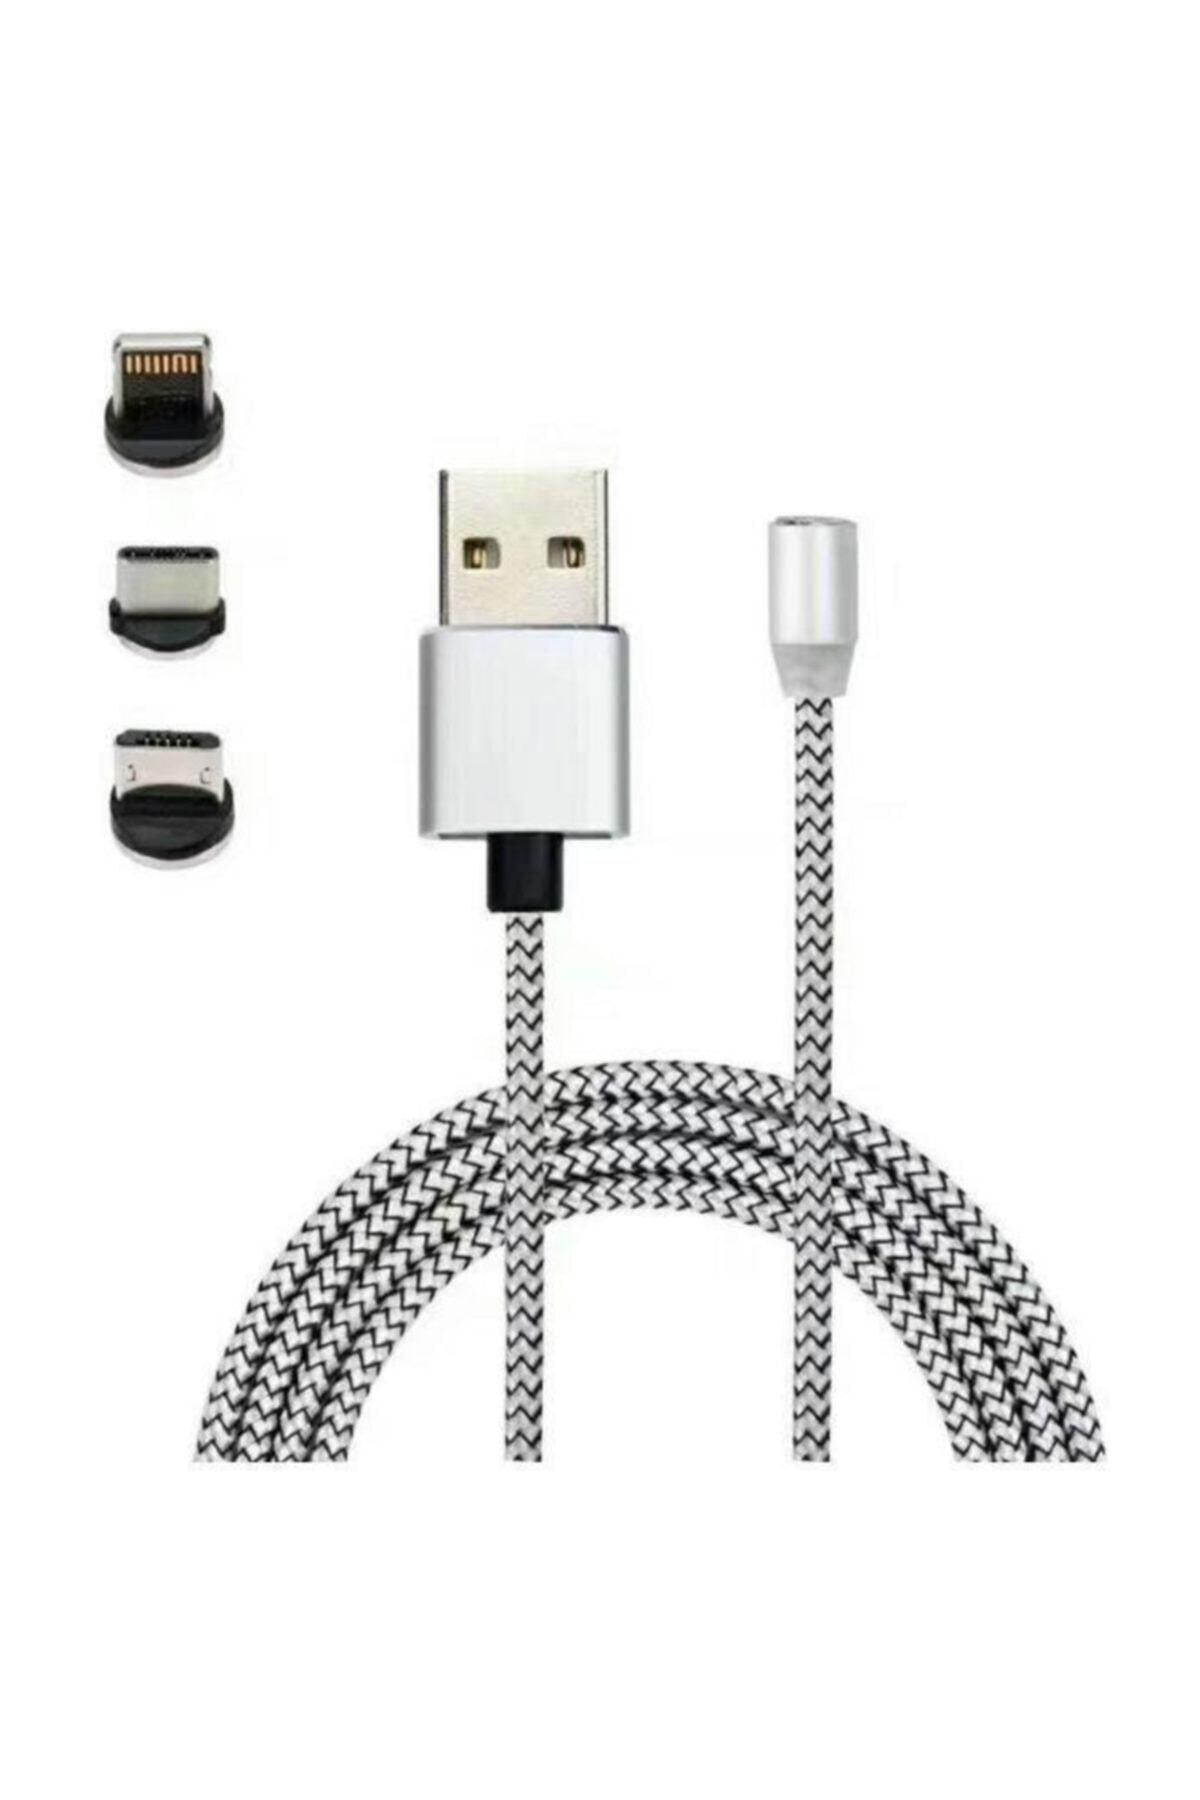 Mmctech Iphone Android Samsung Manyetik Mıknatıslı Micro Usb Type-c Uyumlu Şarj Kablosu 1